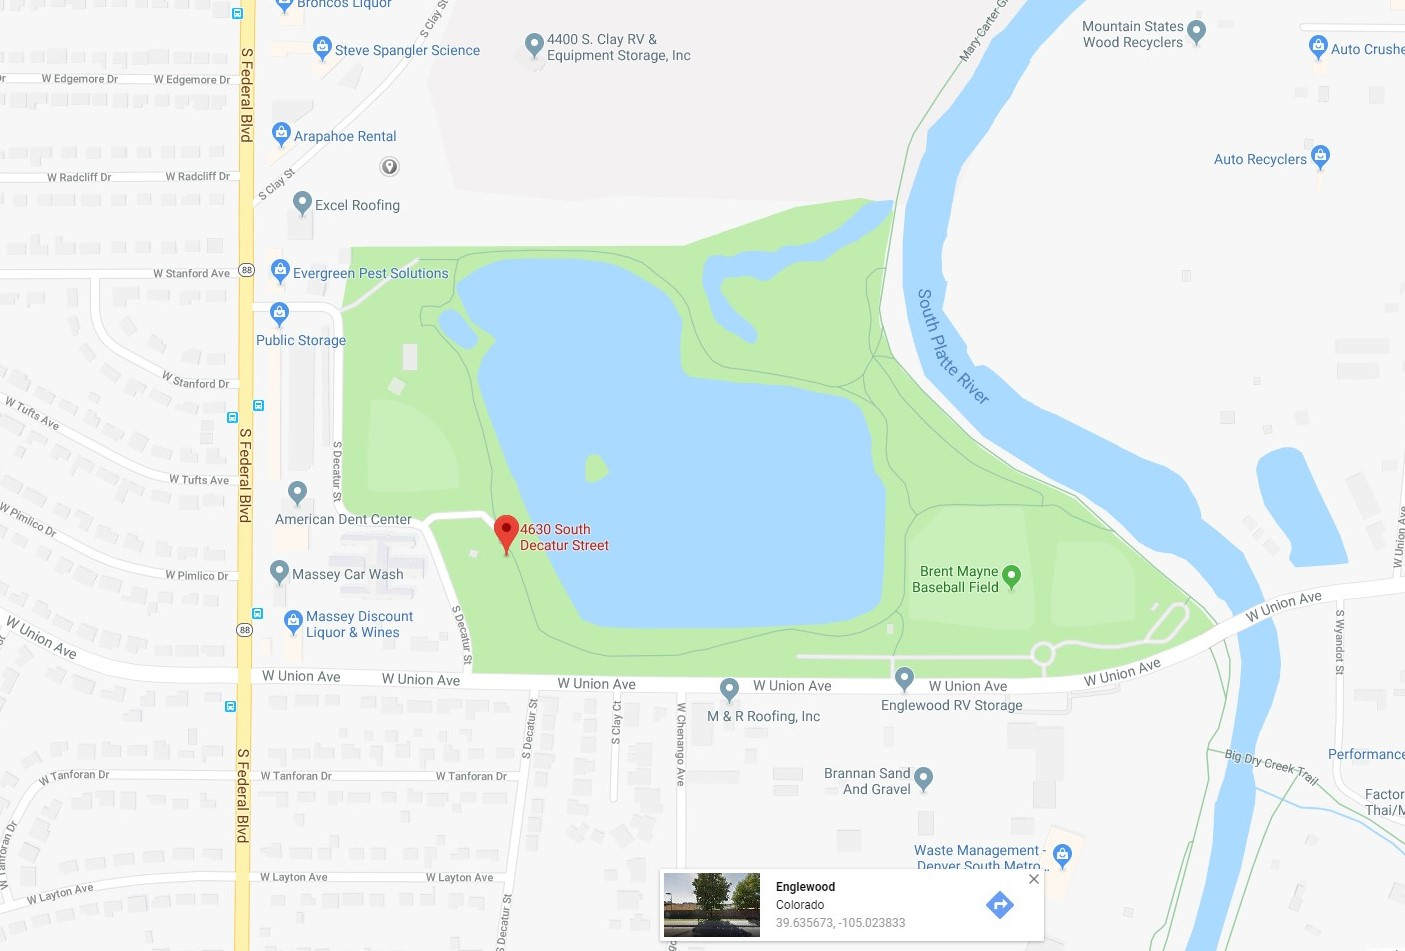 Centennial Park | City of Englewood, Colorado